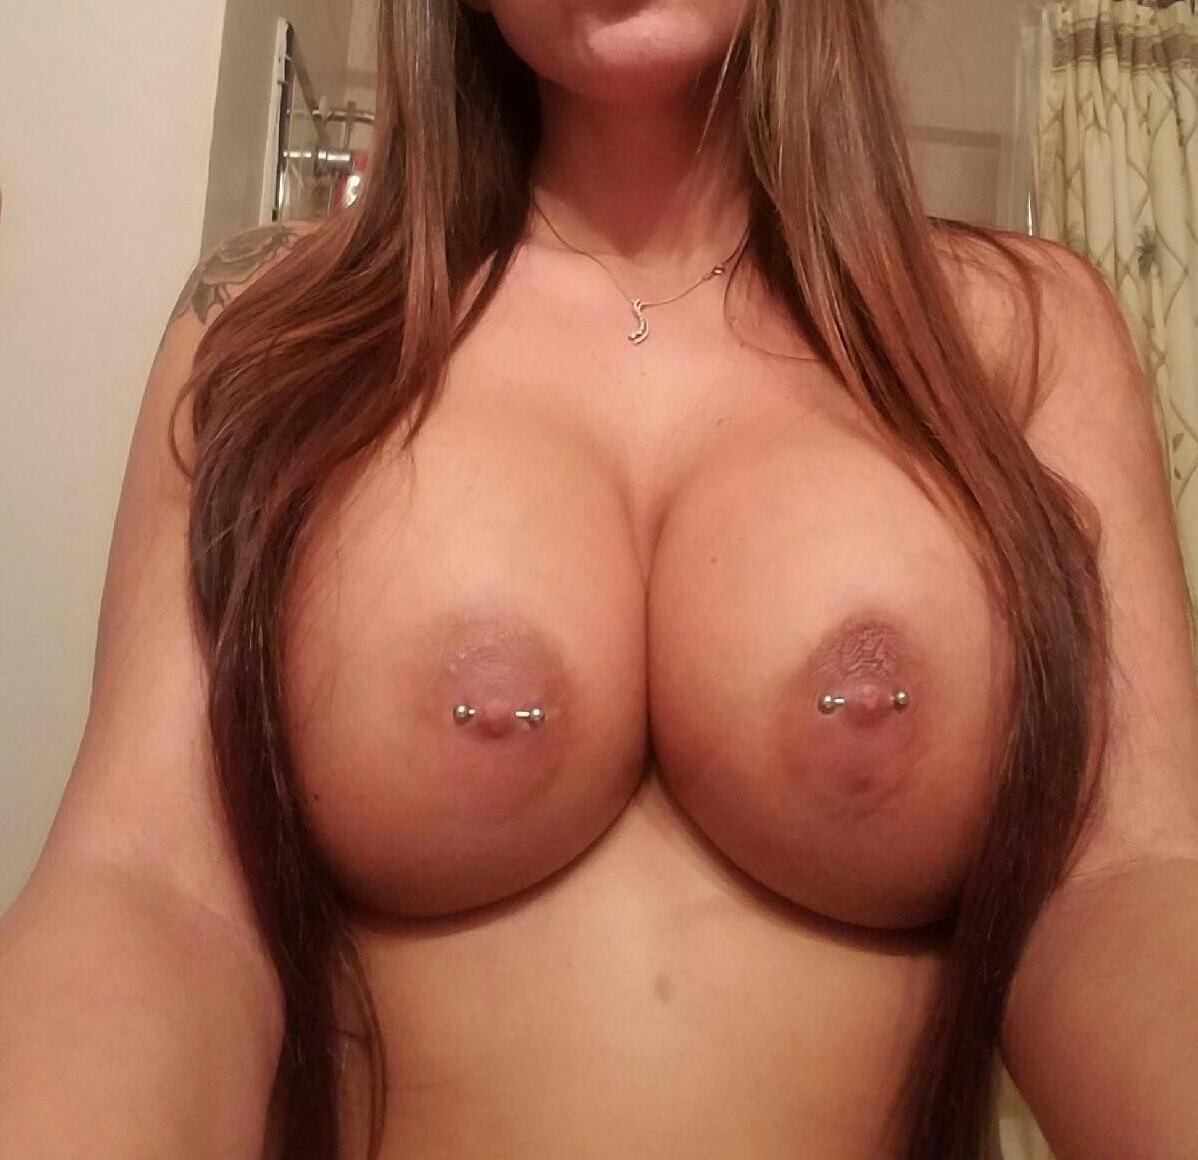 http://www.sextingpics.com/wp-content/uploads/2017/03/20161214_185601.jpg